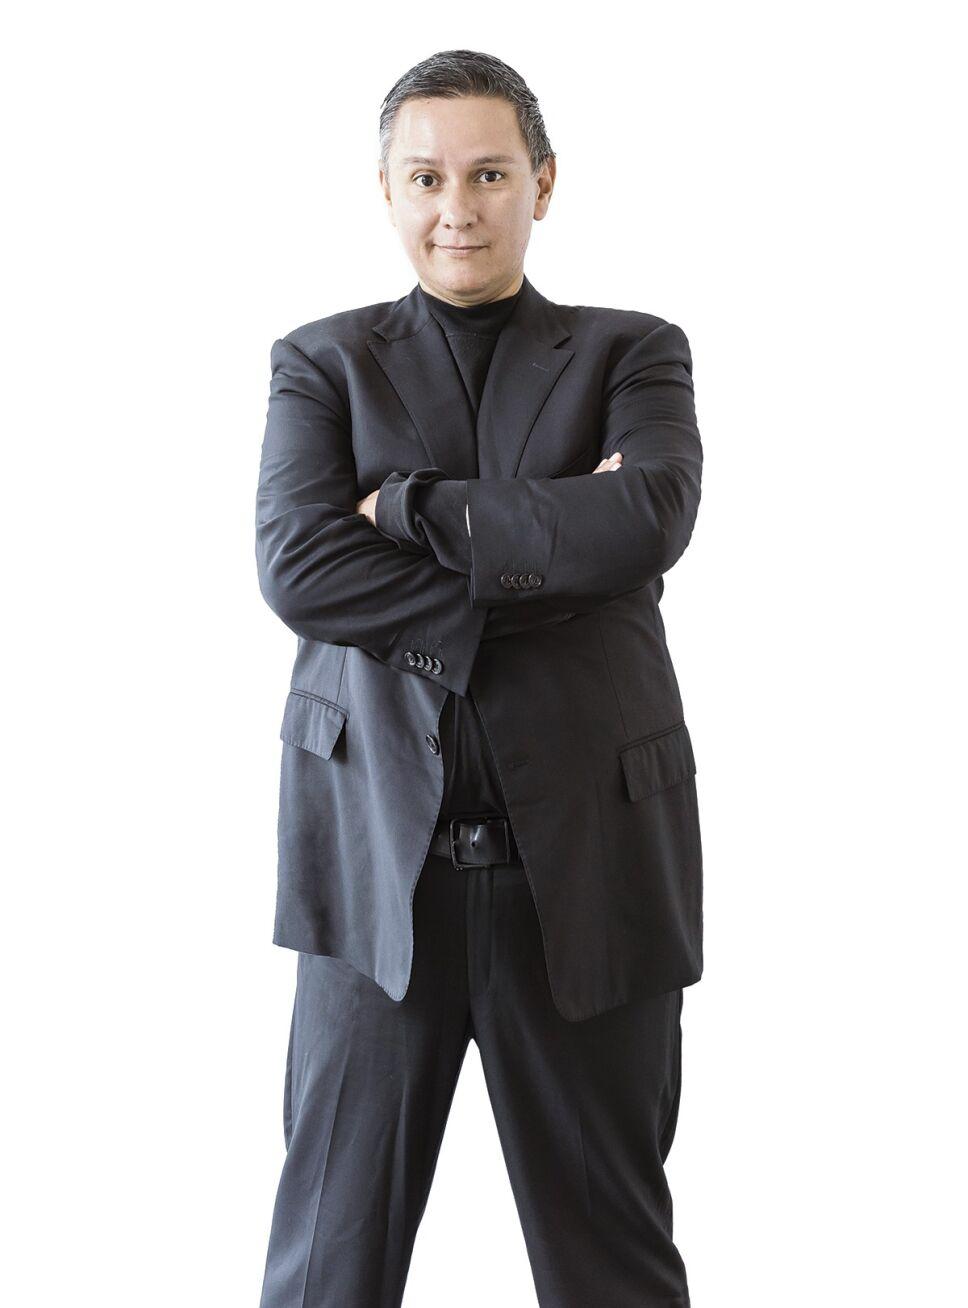 Manuel Guitierrez Novelo